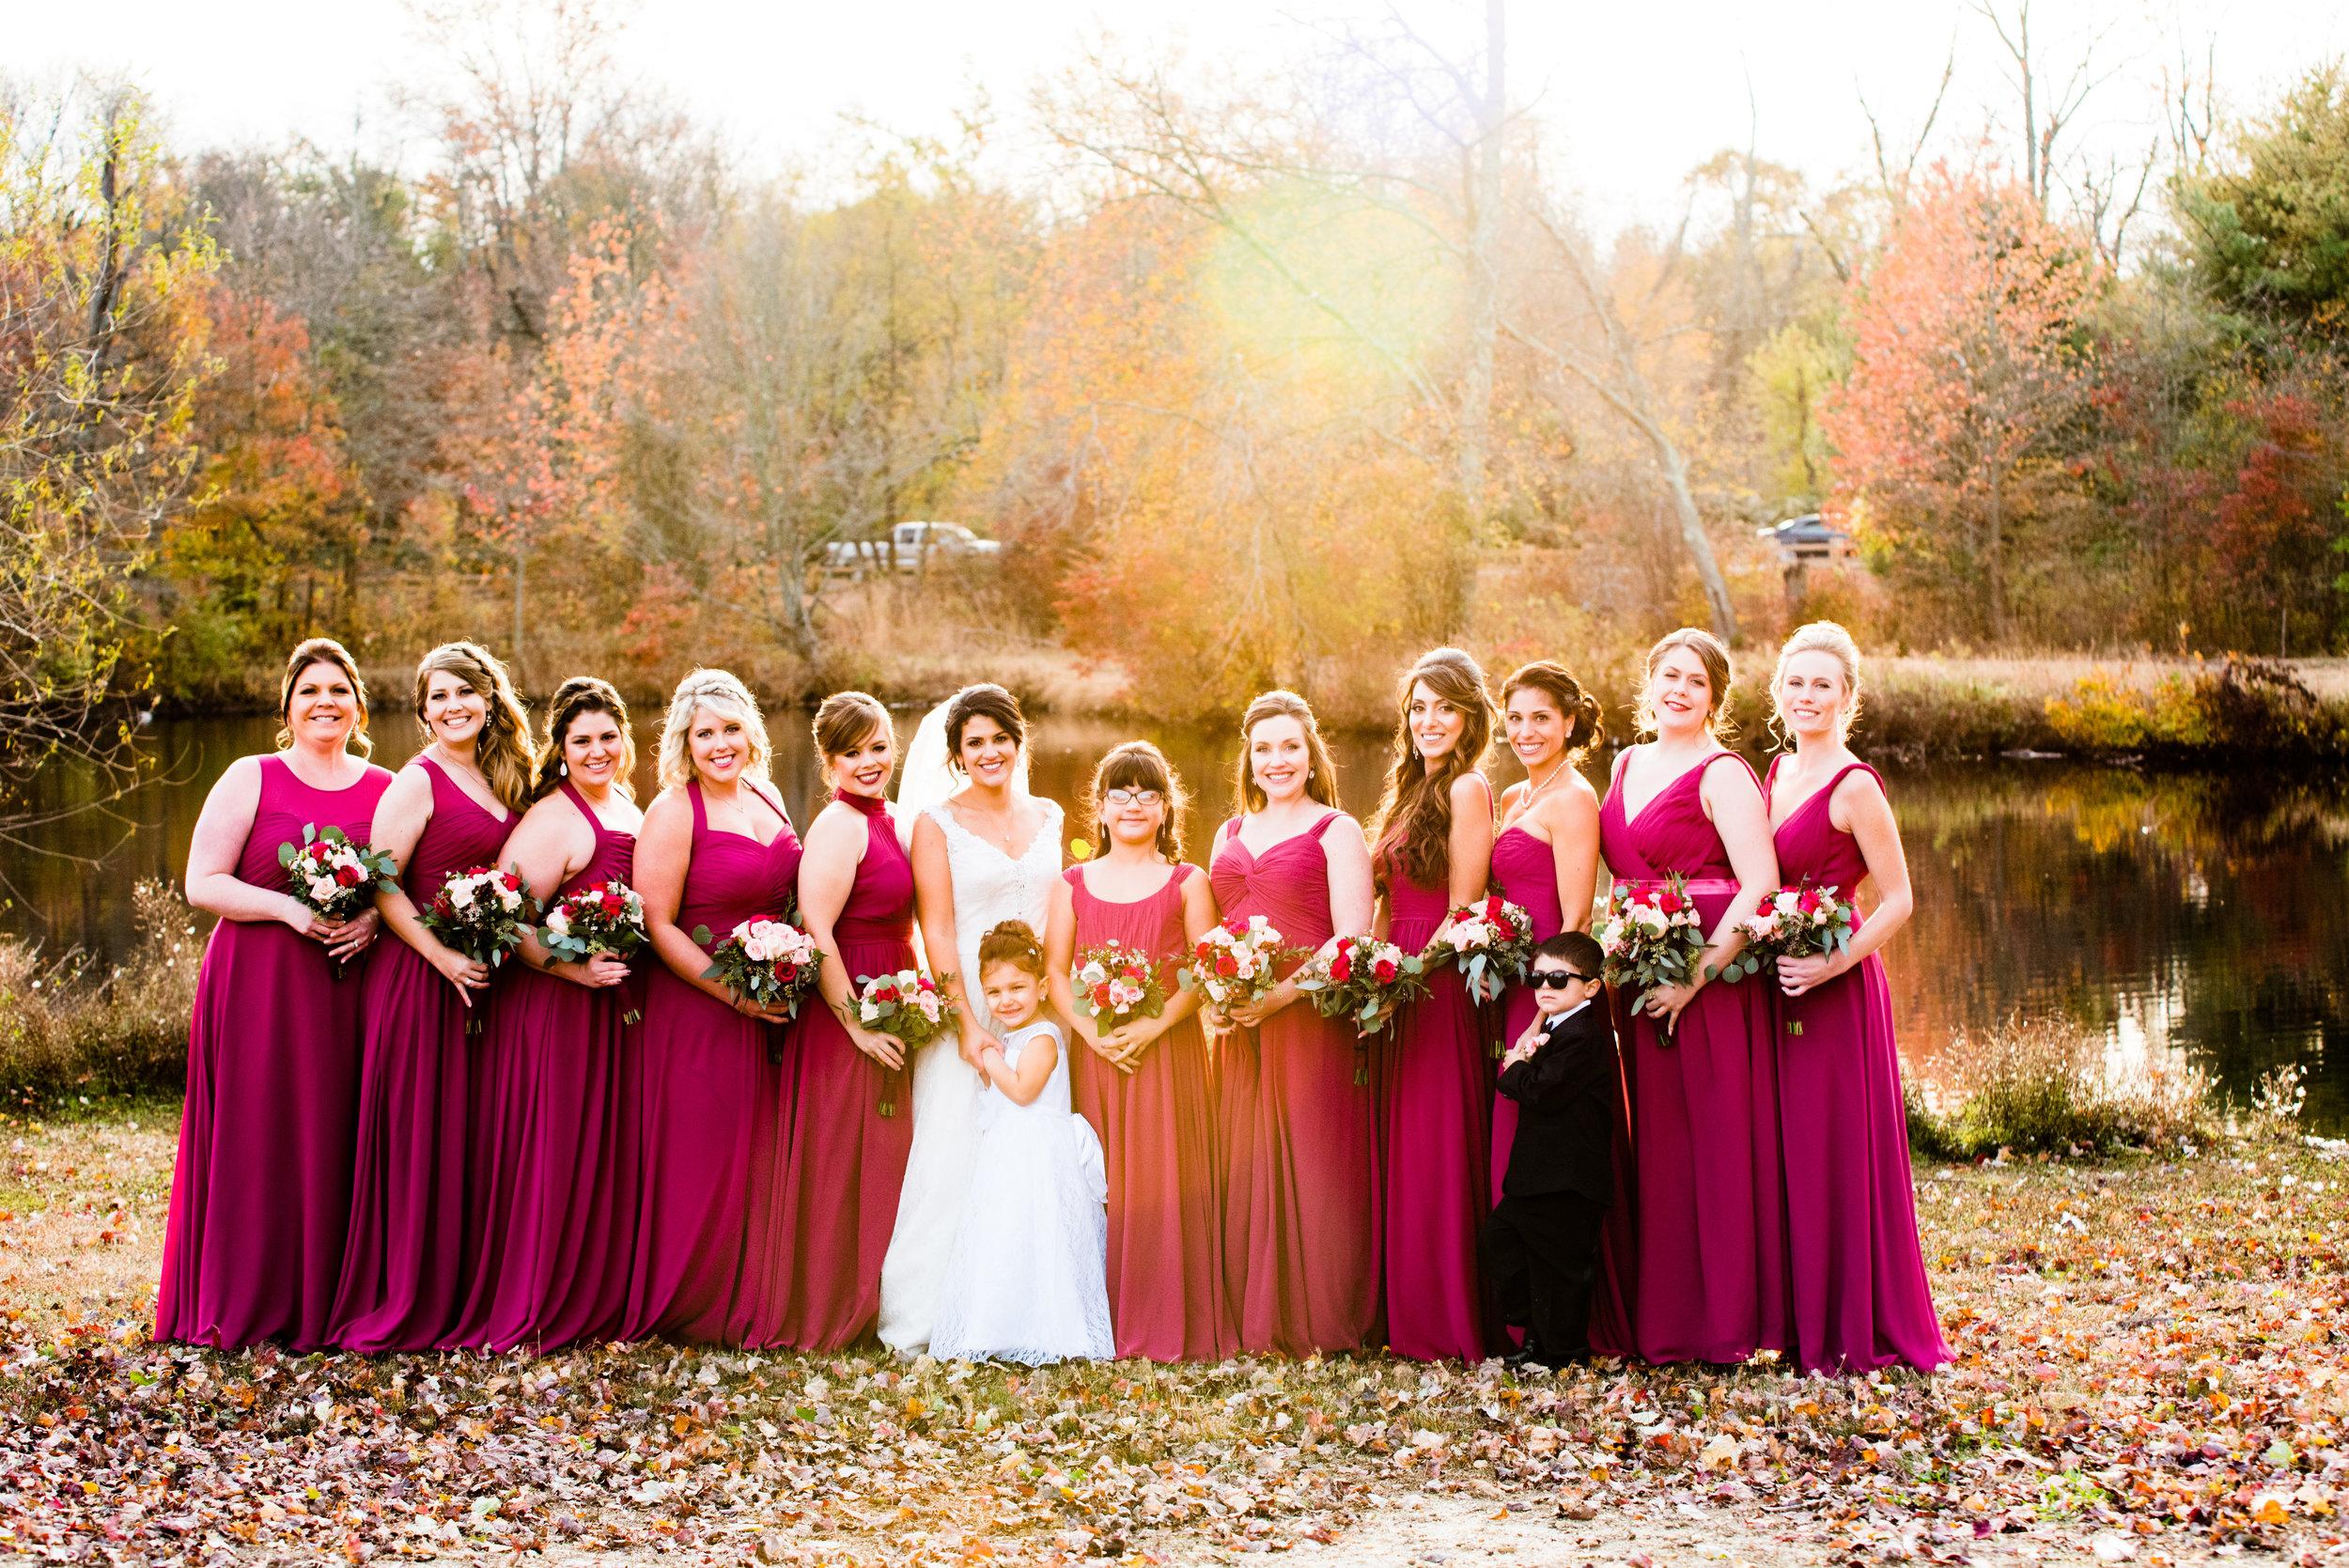 Luciens Manor Wedding Photos - 055.jpg